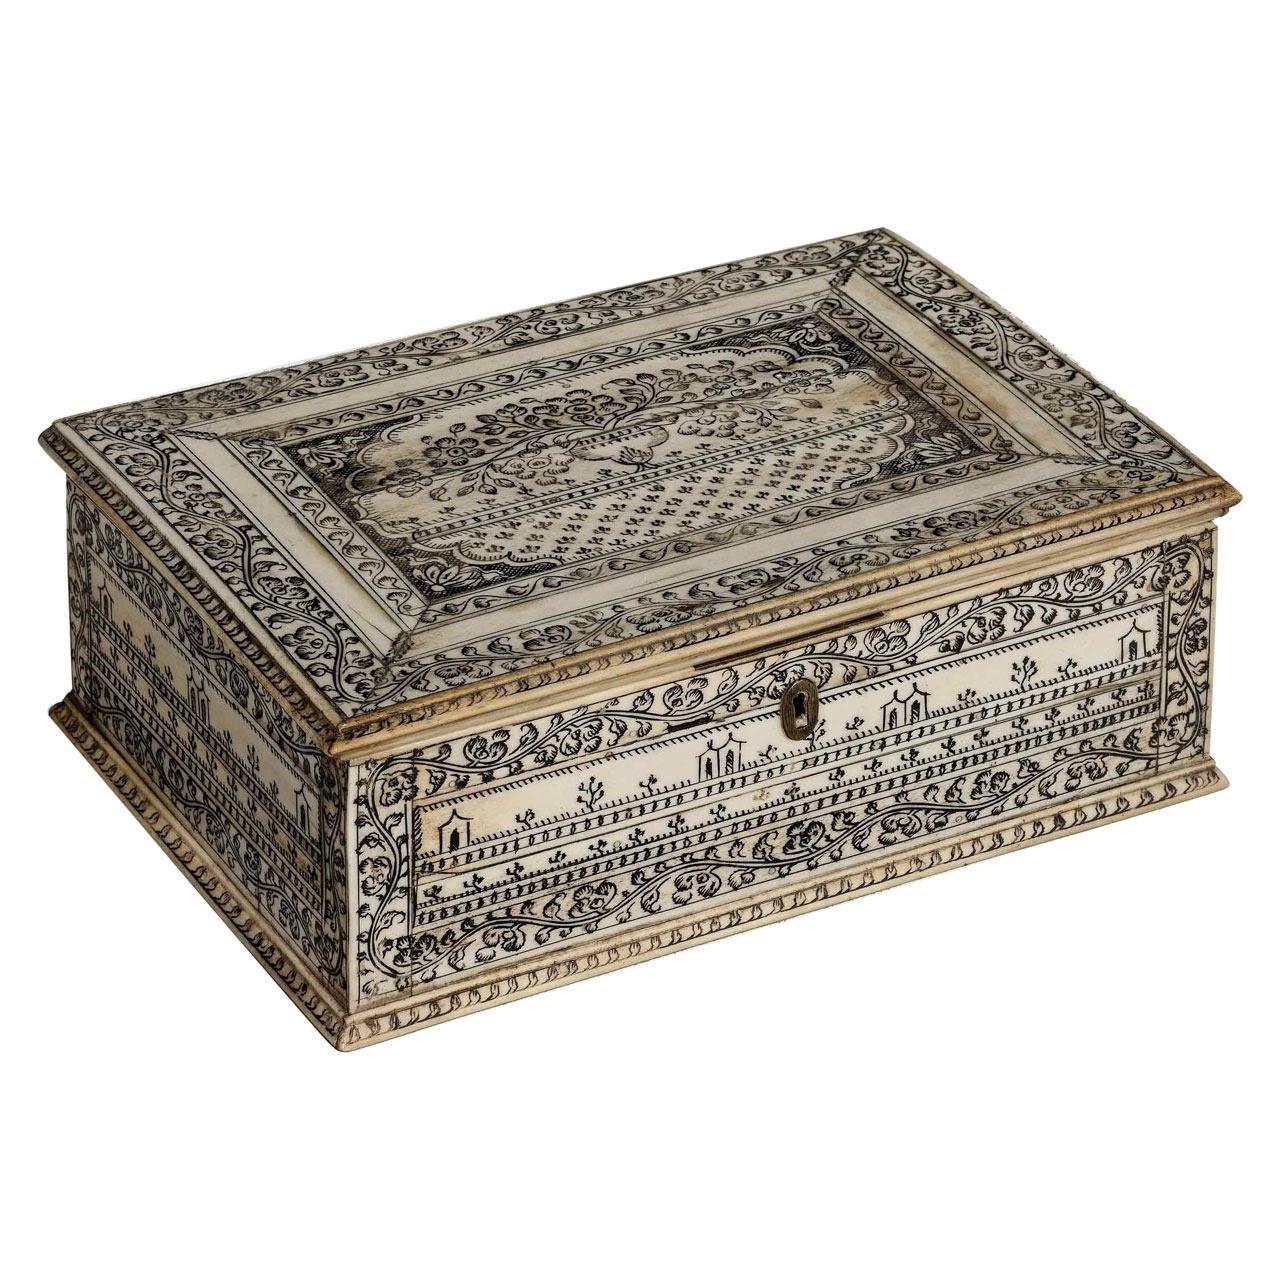 Decorative Bone Boxes : Early th century vizagapatam bone box for sale at stdibs